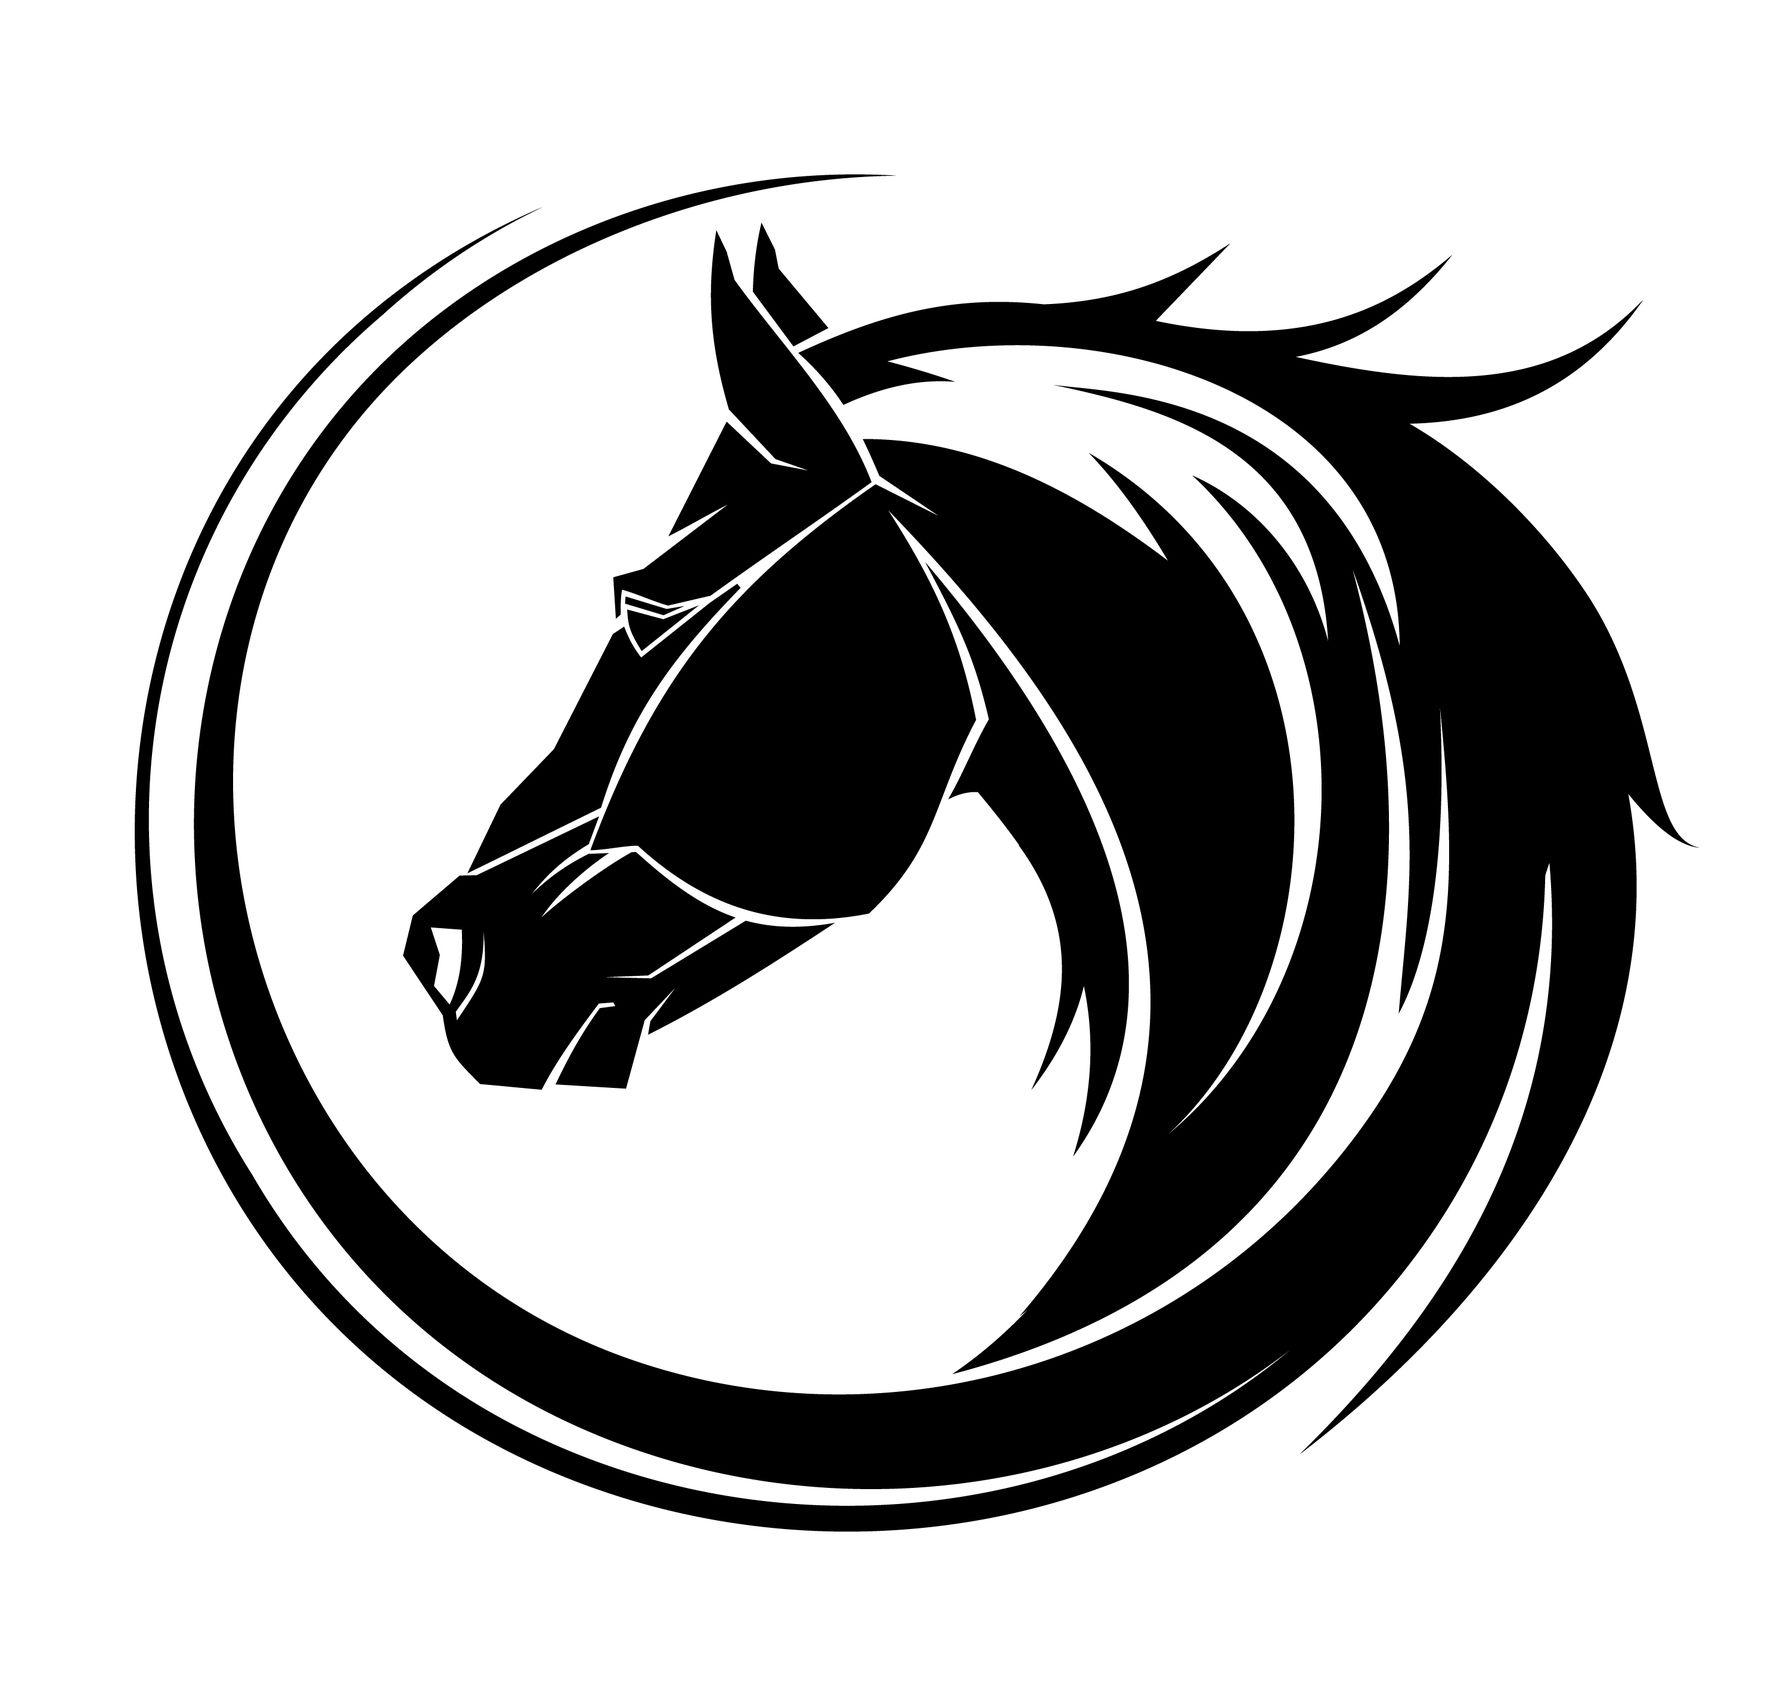 4ceb2dfa3eb Tribal Horse Tattoos for Women | cute horse head tattoo | Tattoo ...